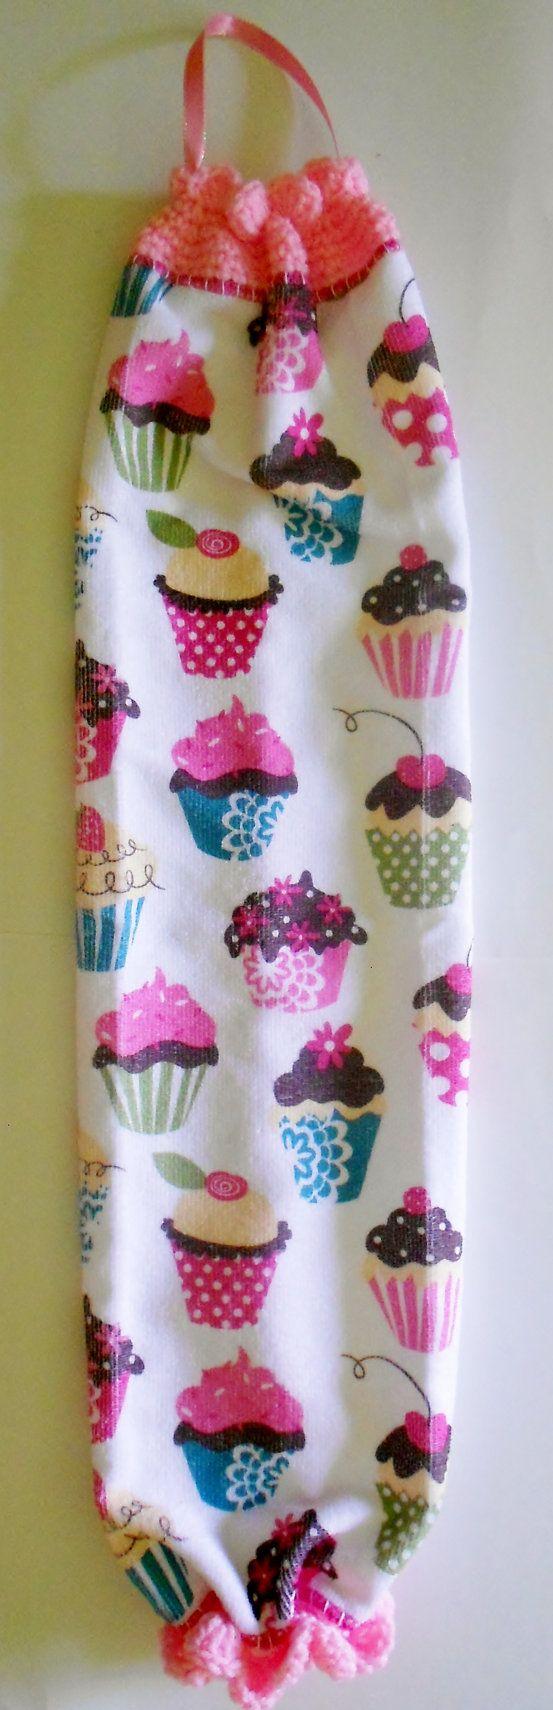 Cupcake Kitchen Decorations 25 Best Ideas About Cupcake Kitchen Decor On Pinterest Cupcake